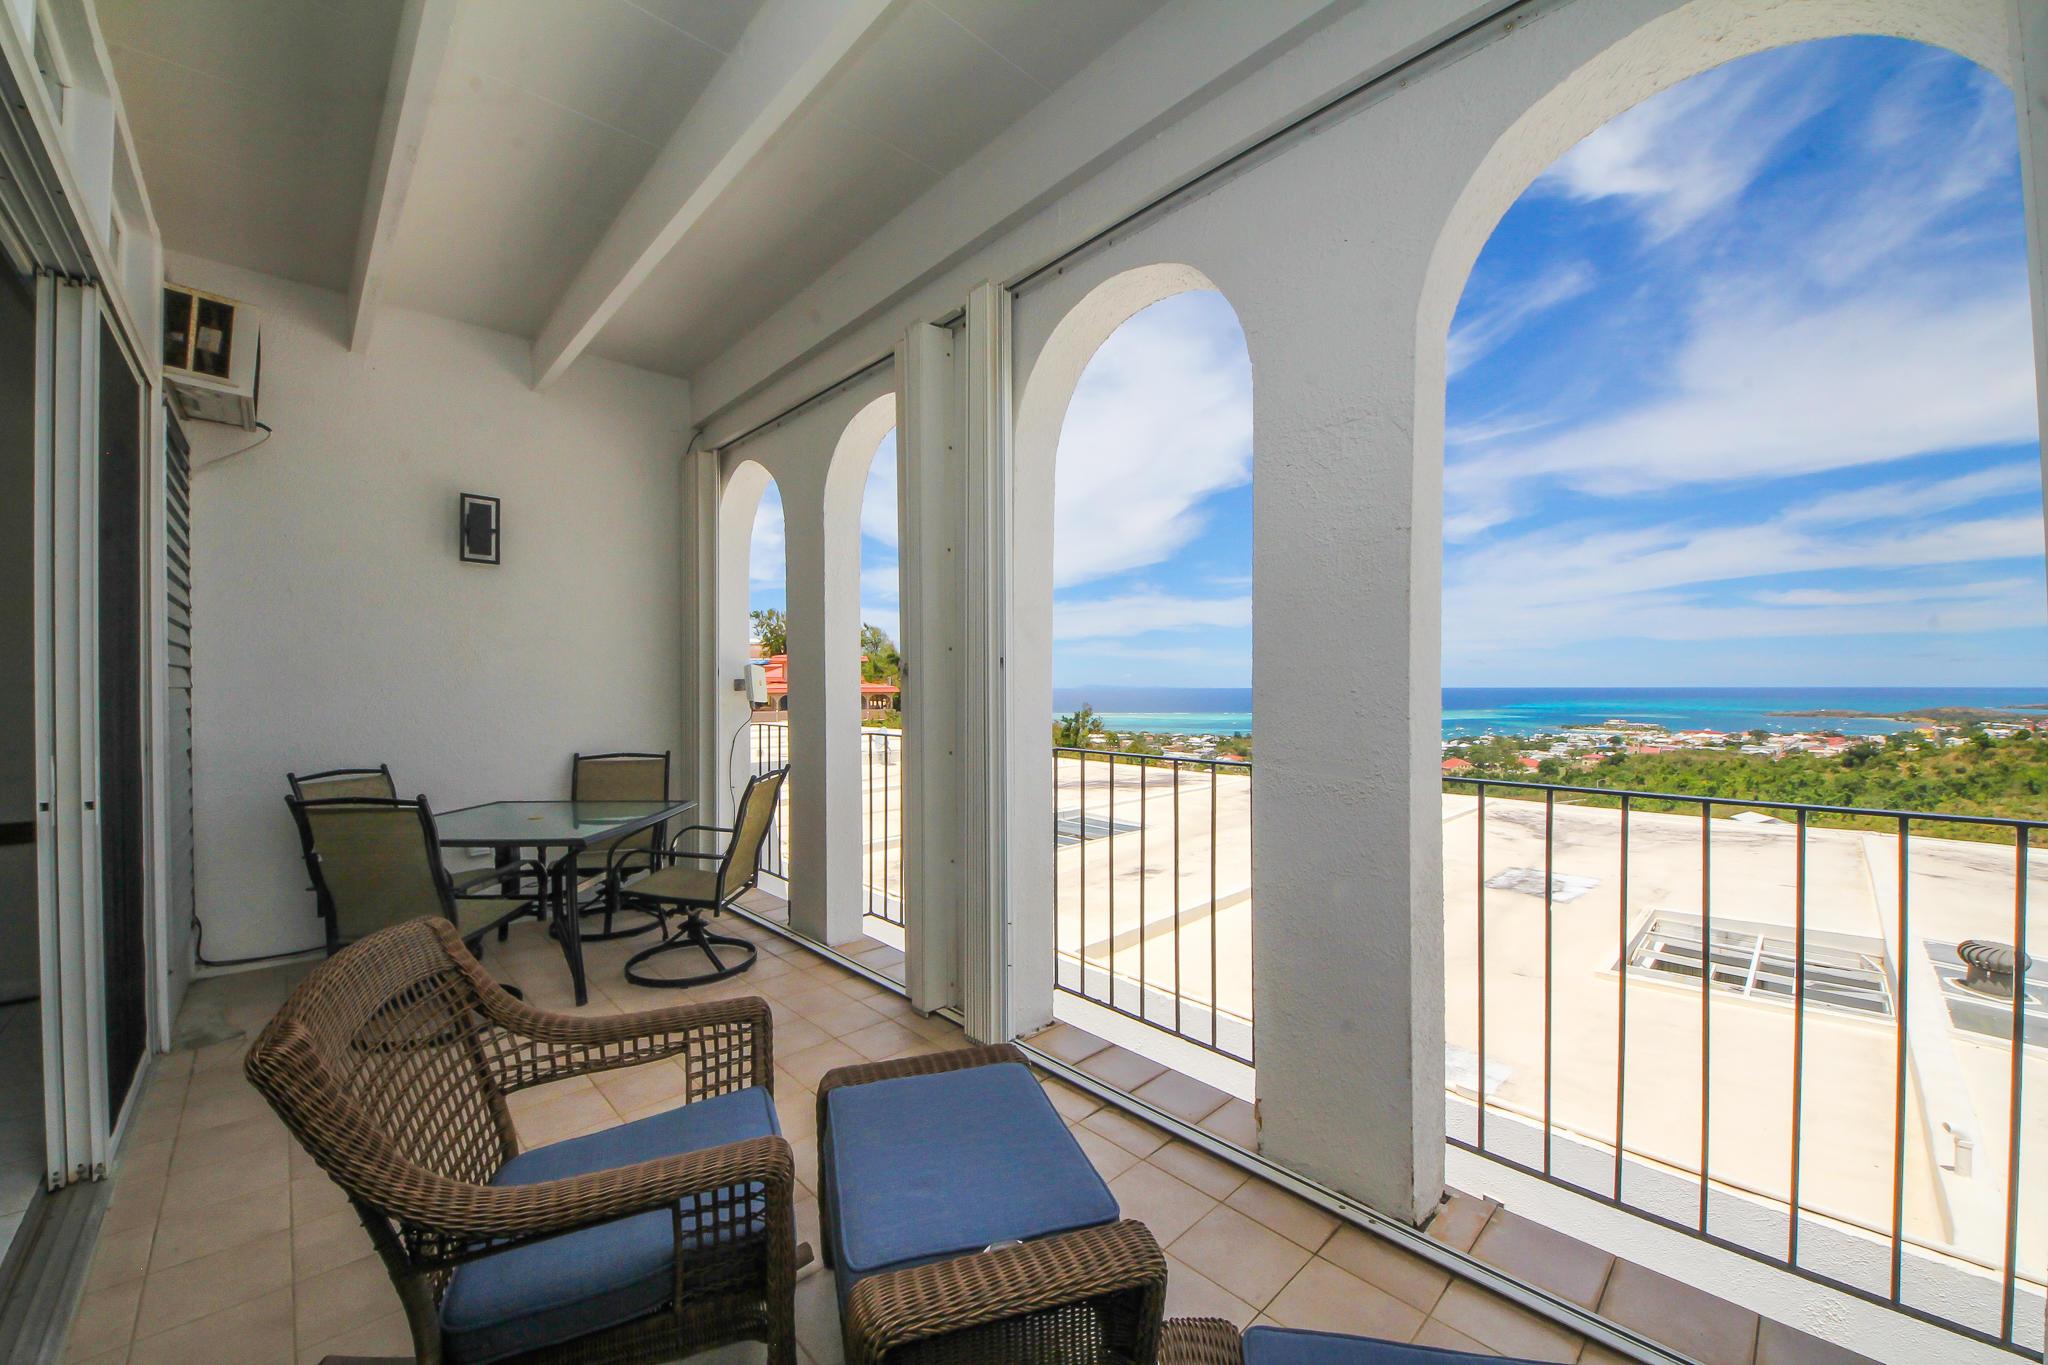 Porch & View